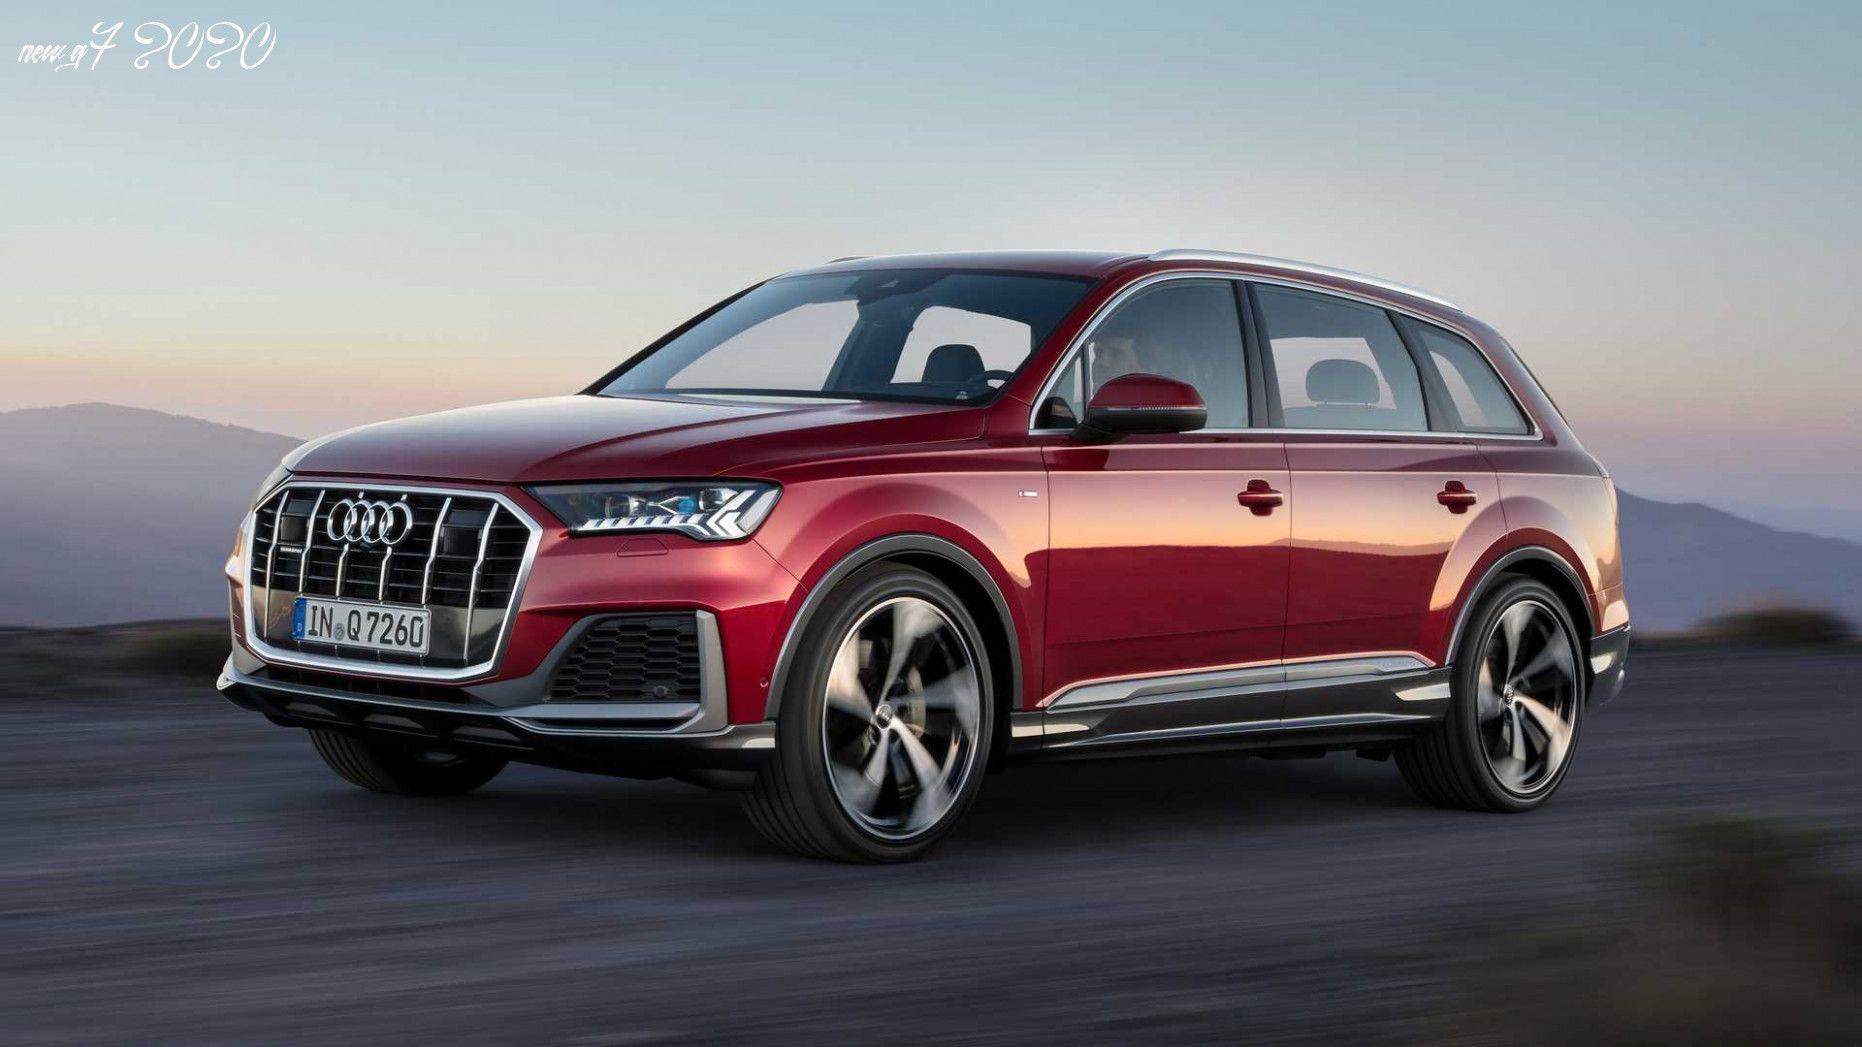 New Q7 2020 In 2020 Audi Q7 Audi Audi Q